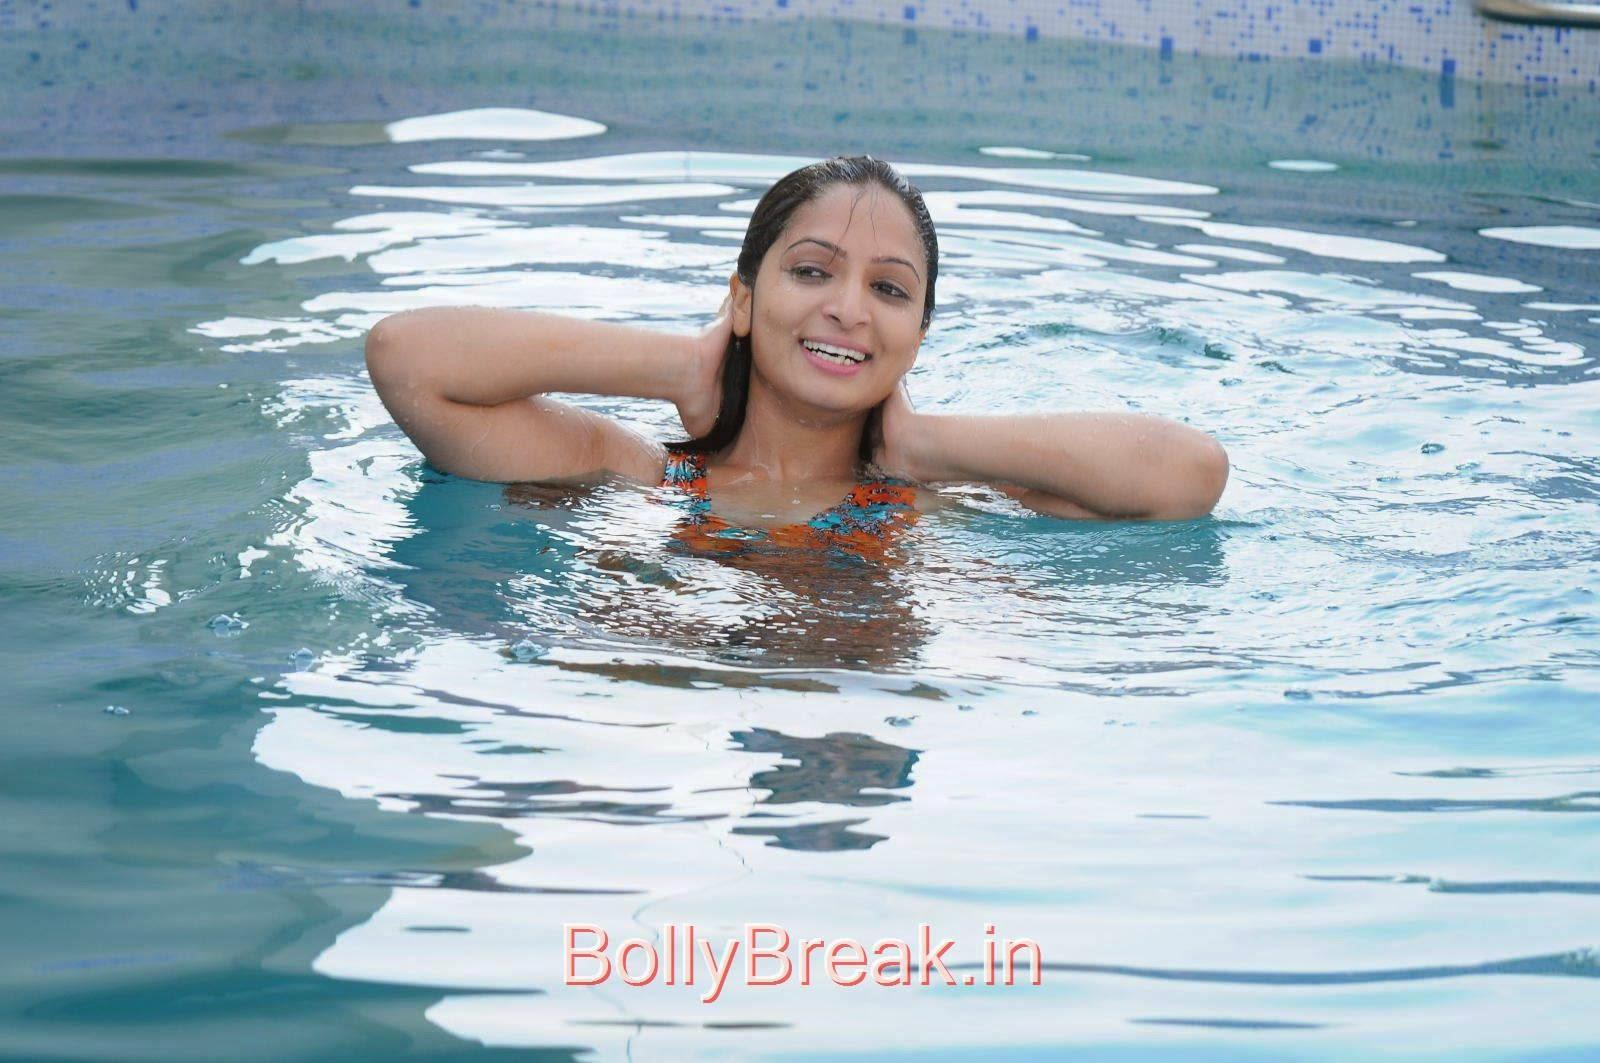 Hot Hd Images Of Priya Vashishta Stills From Swimming Pool Movie 13 Pics